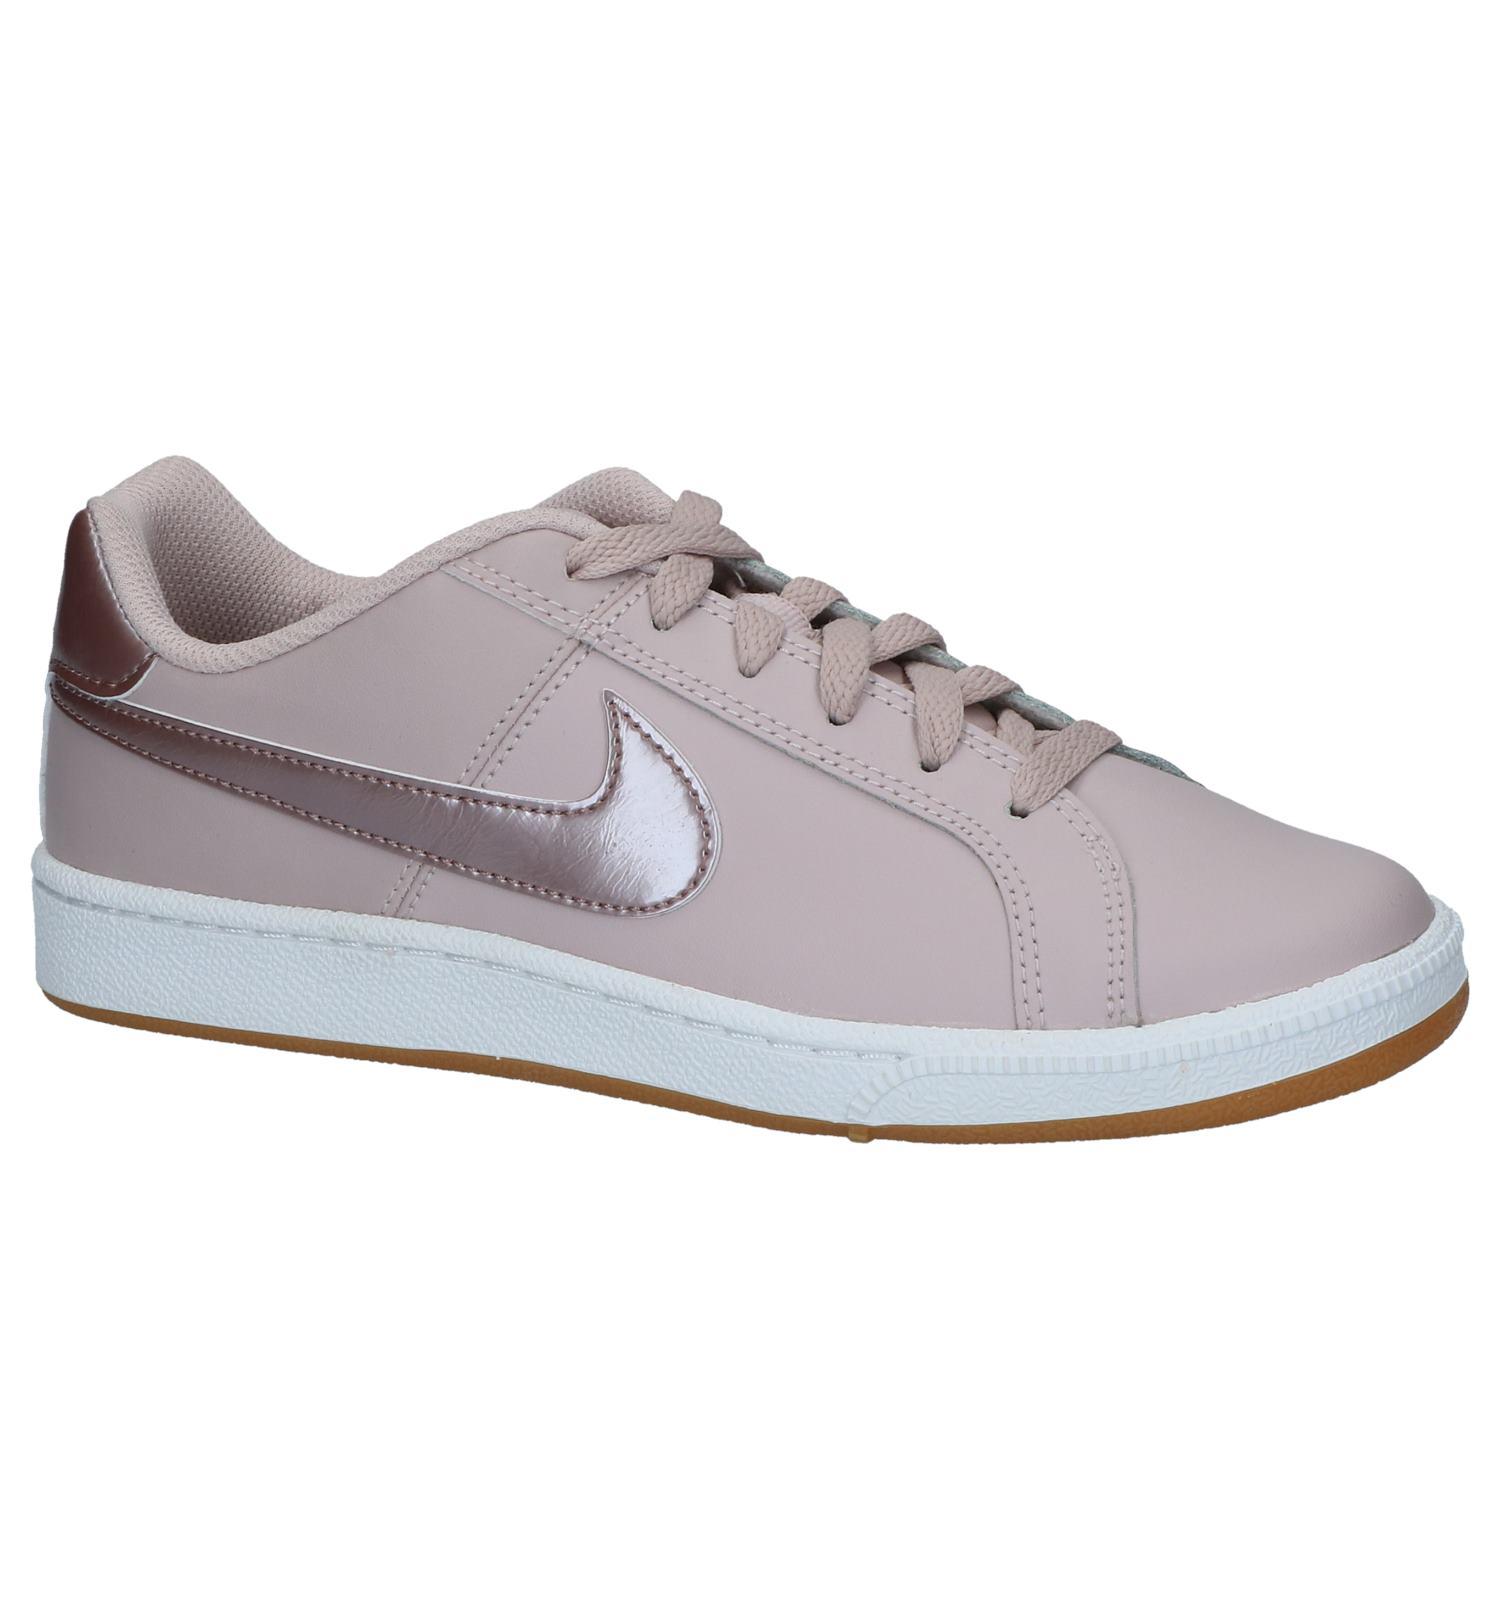 Roze Nike Court Royale Sneakers | TORFS.BE | Gratis verzend en retour